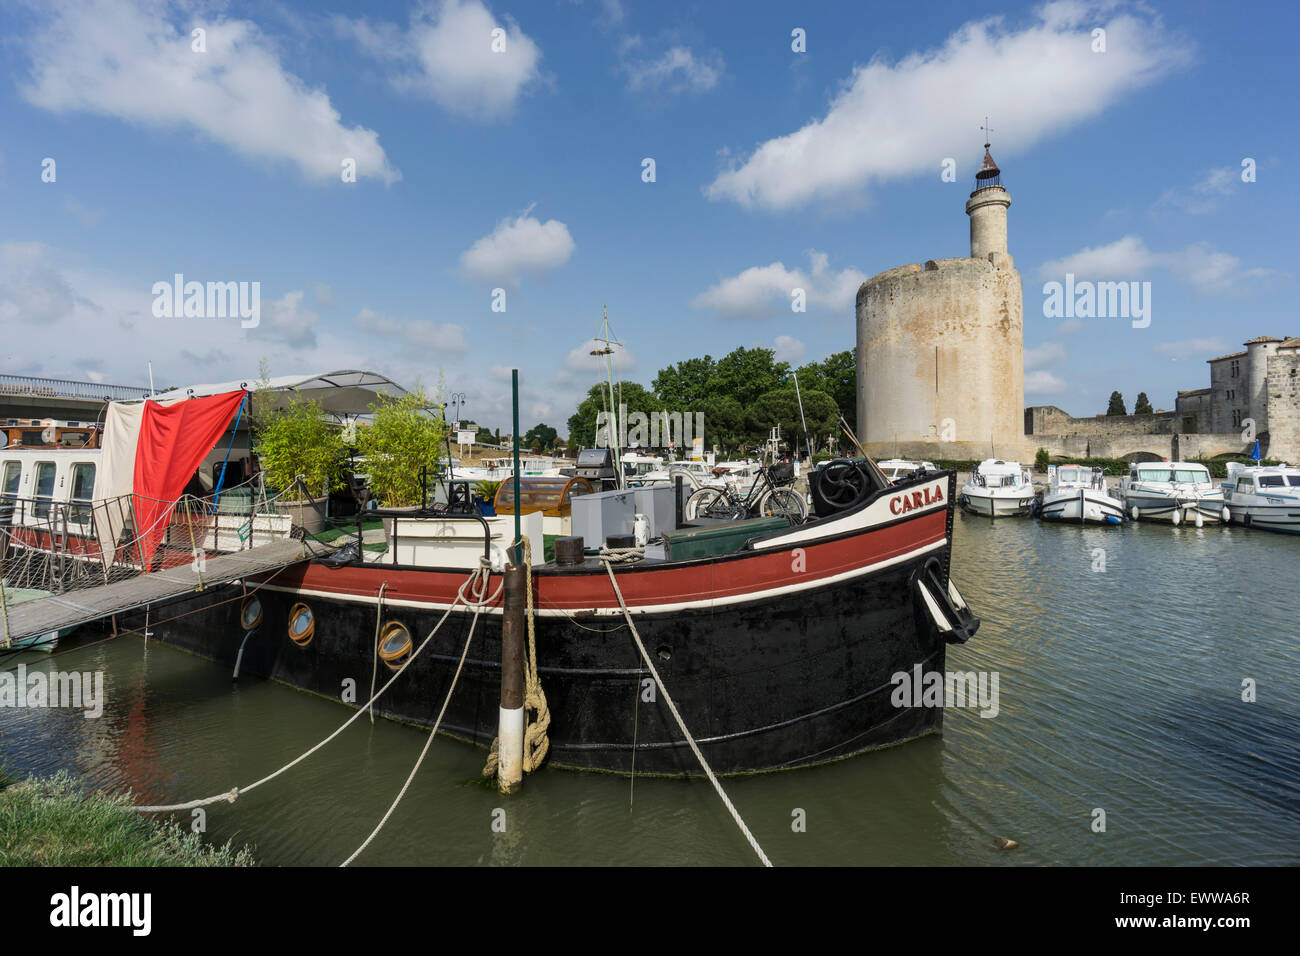 Marina, Aigues-Mortes, Provence, Camargue, Languedoc-Roussillon, France Avignon, Bouche du Rhone, France - Stock Image